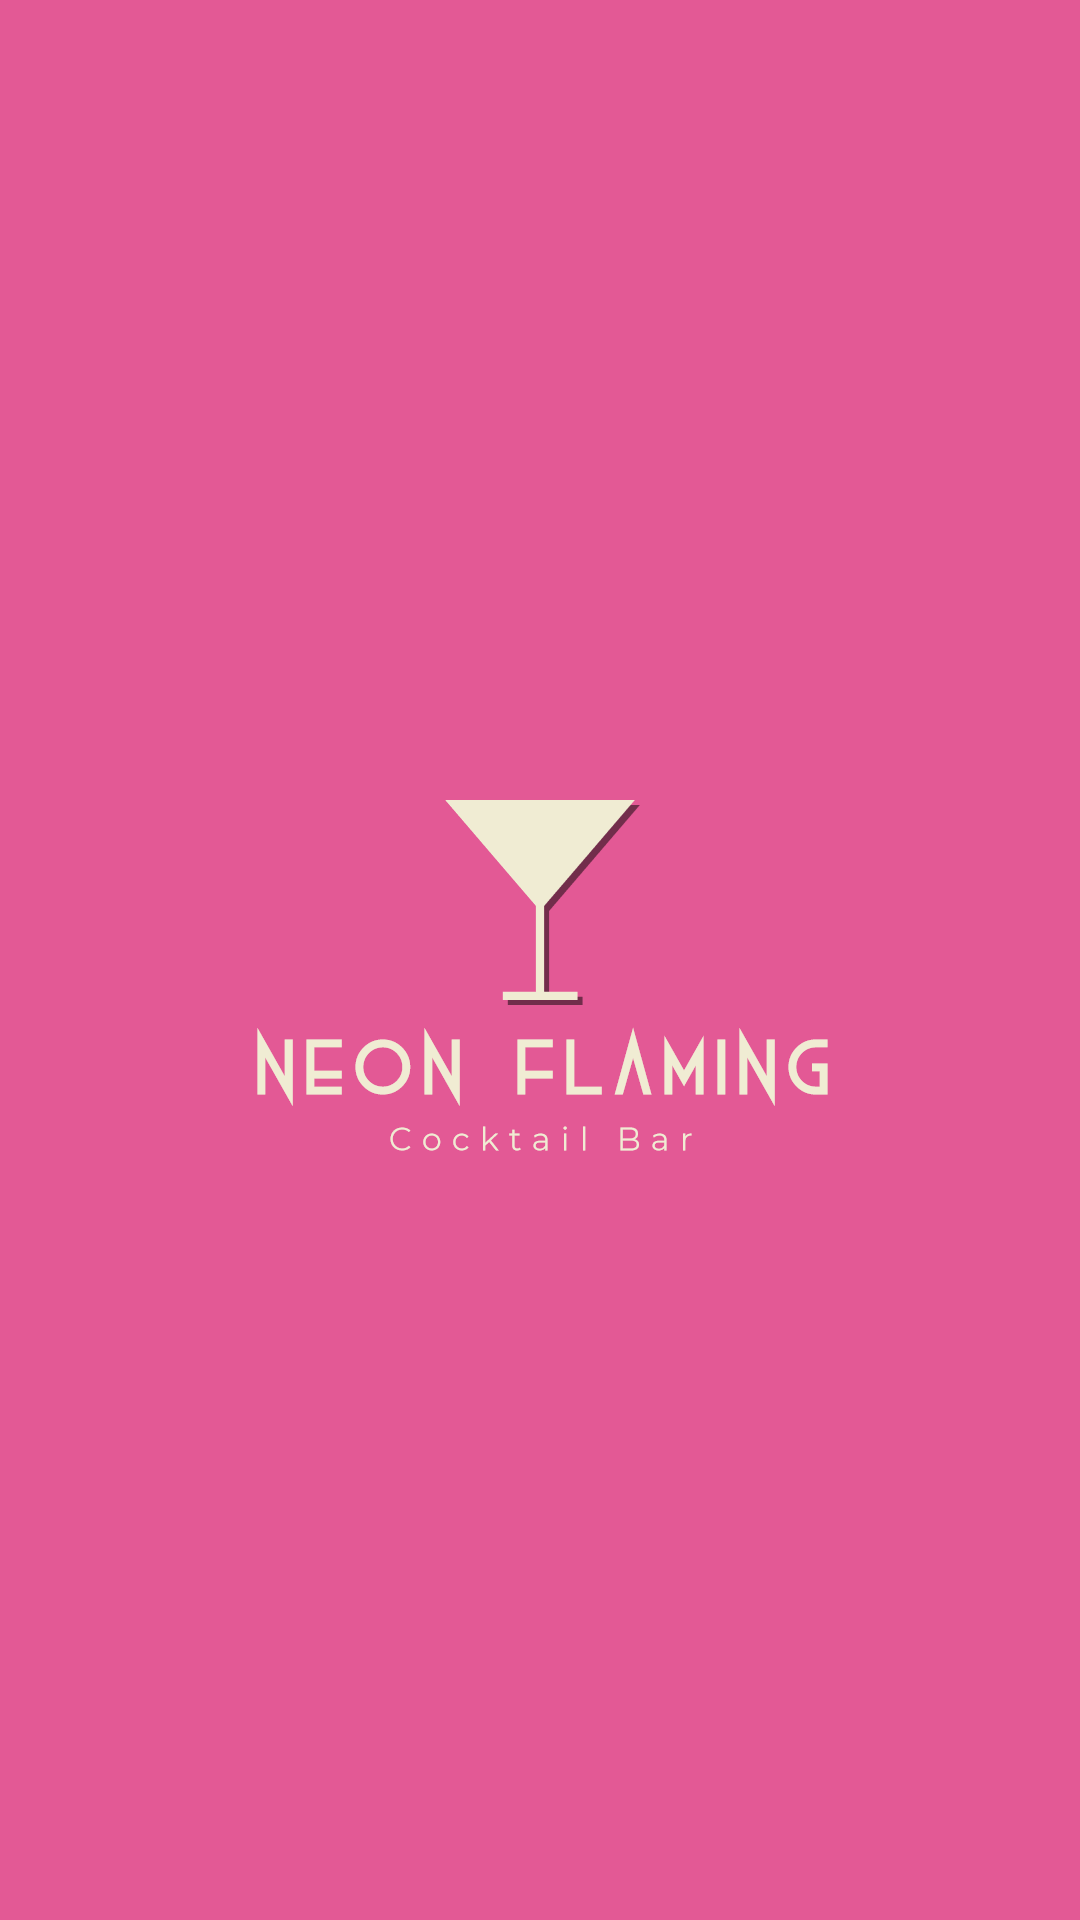 Editable Cocktail Bar Logo Easy to Design  Template